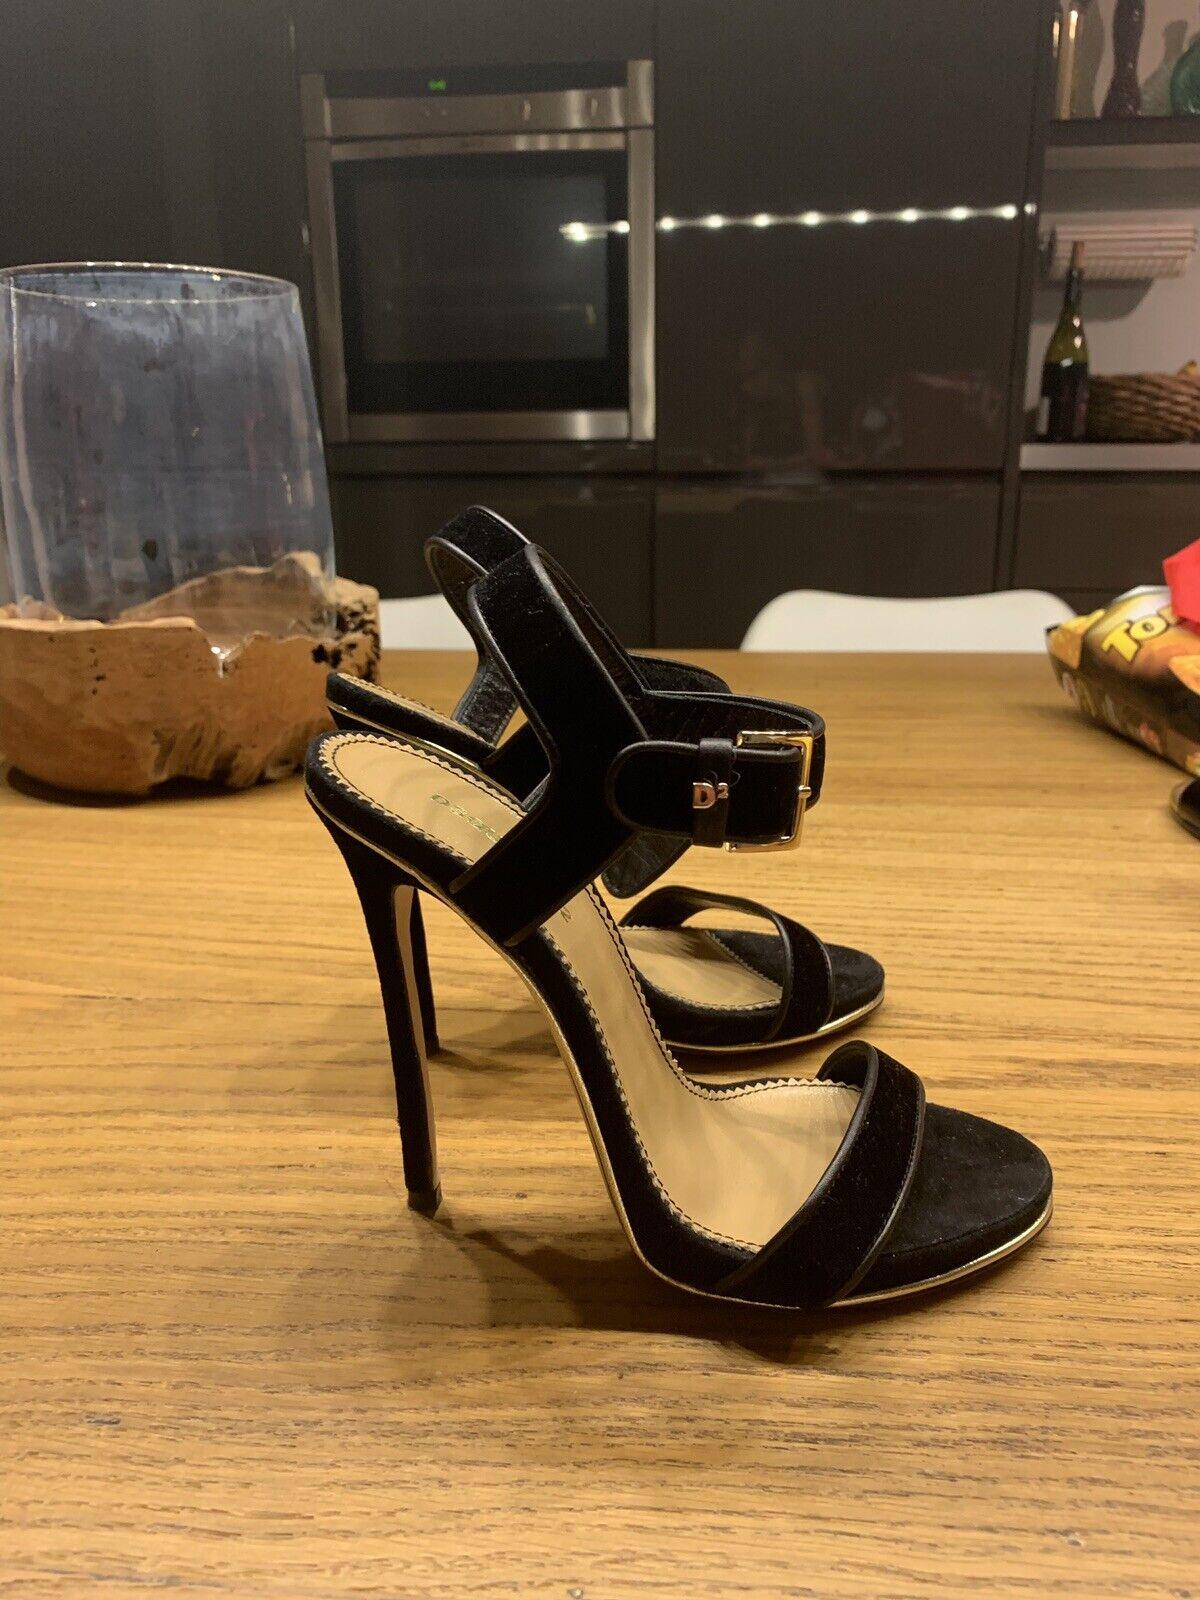 Dsquarojo 2 sandalia, GR 36, terciopelo, np 729,00 euros, impecable, blogueros Style